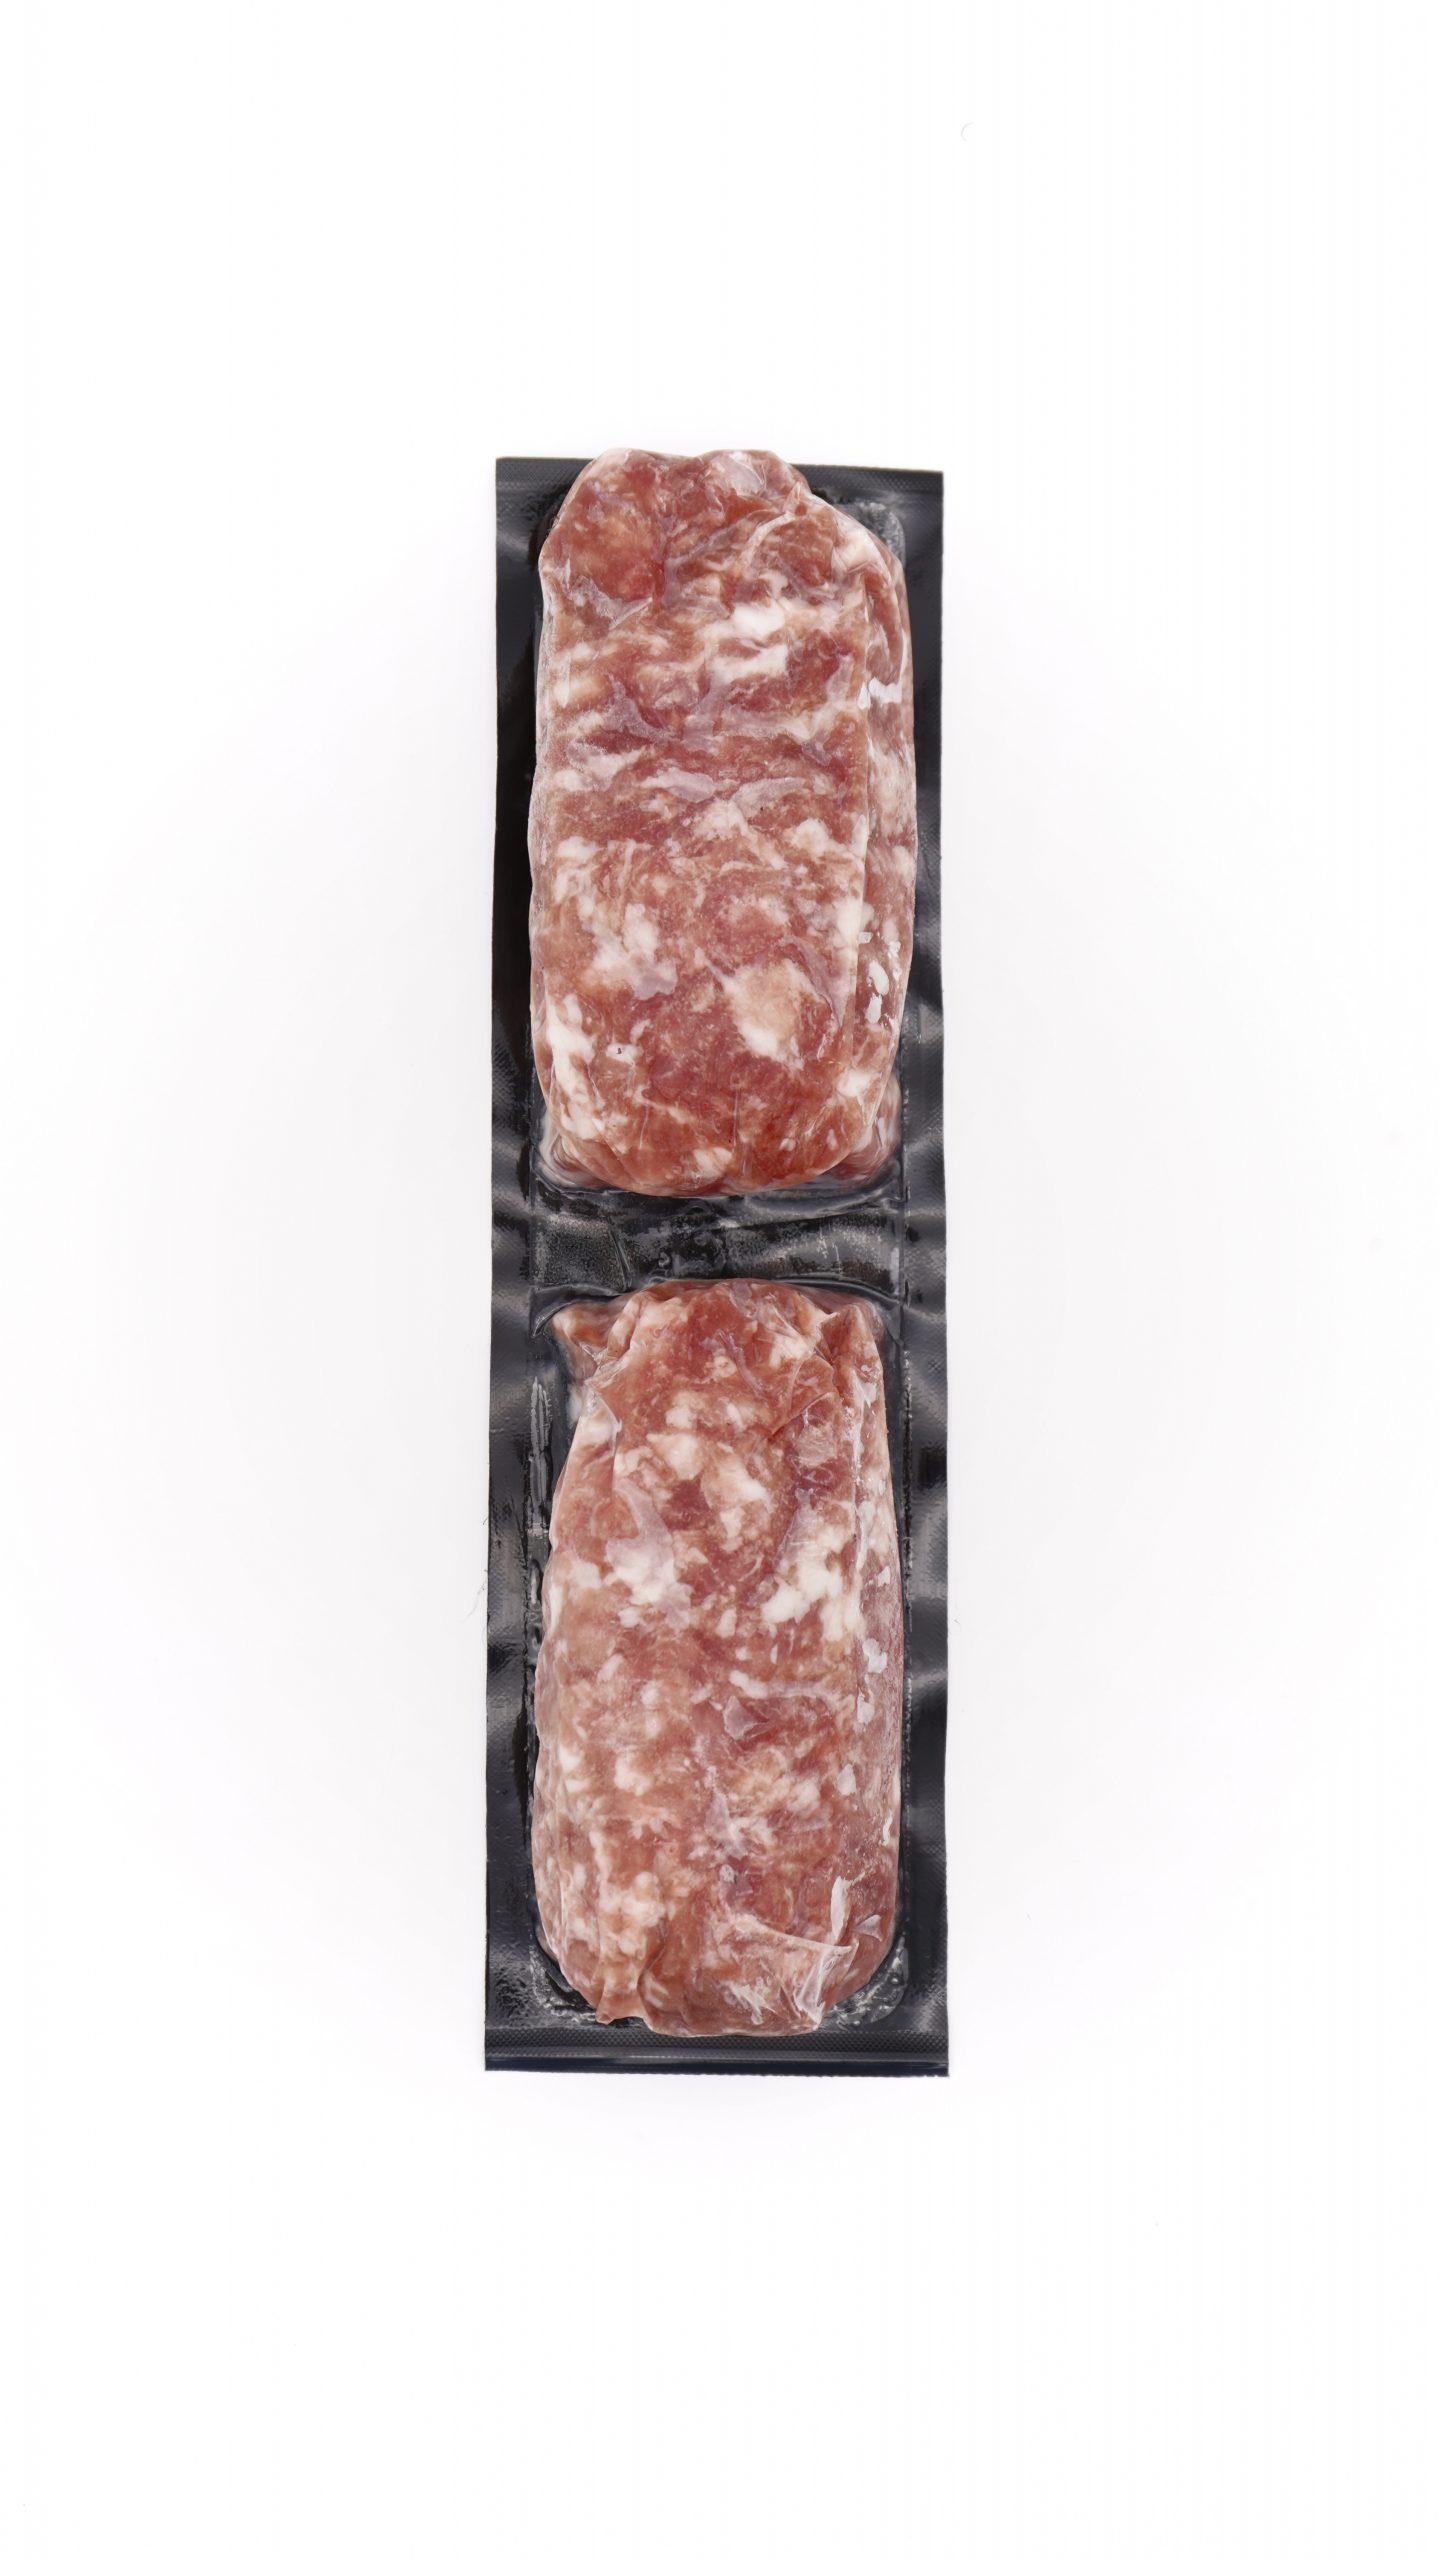 Batalle Spainish Pork Minced Meat 300g X2